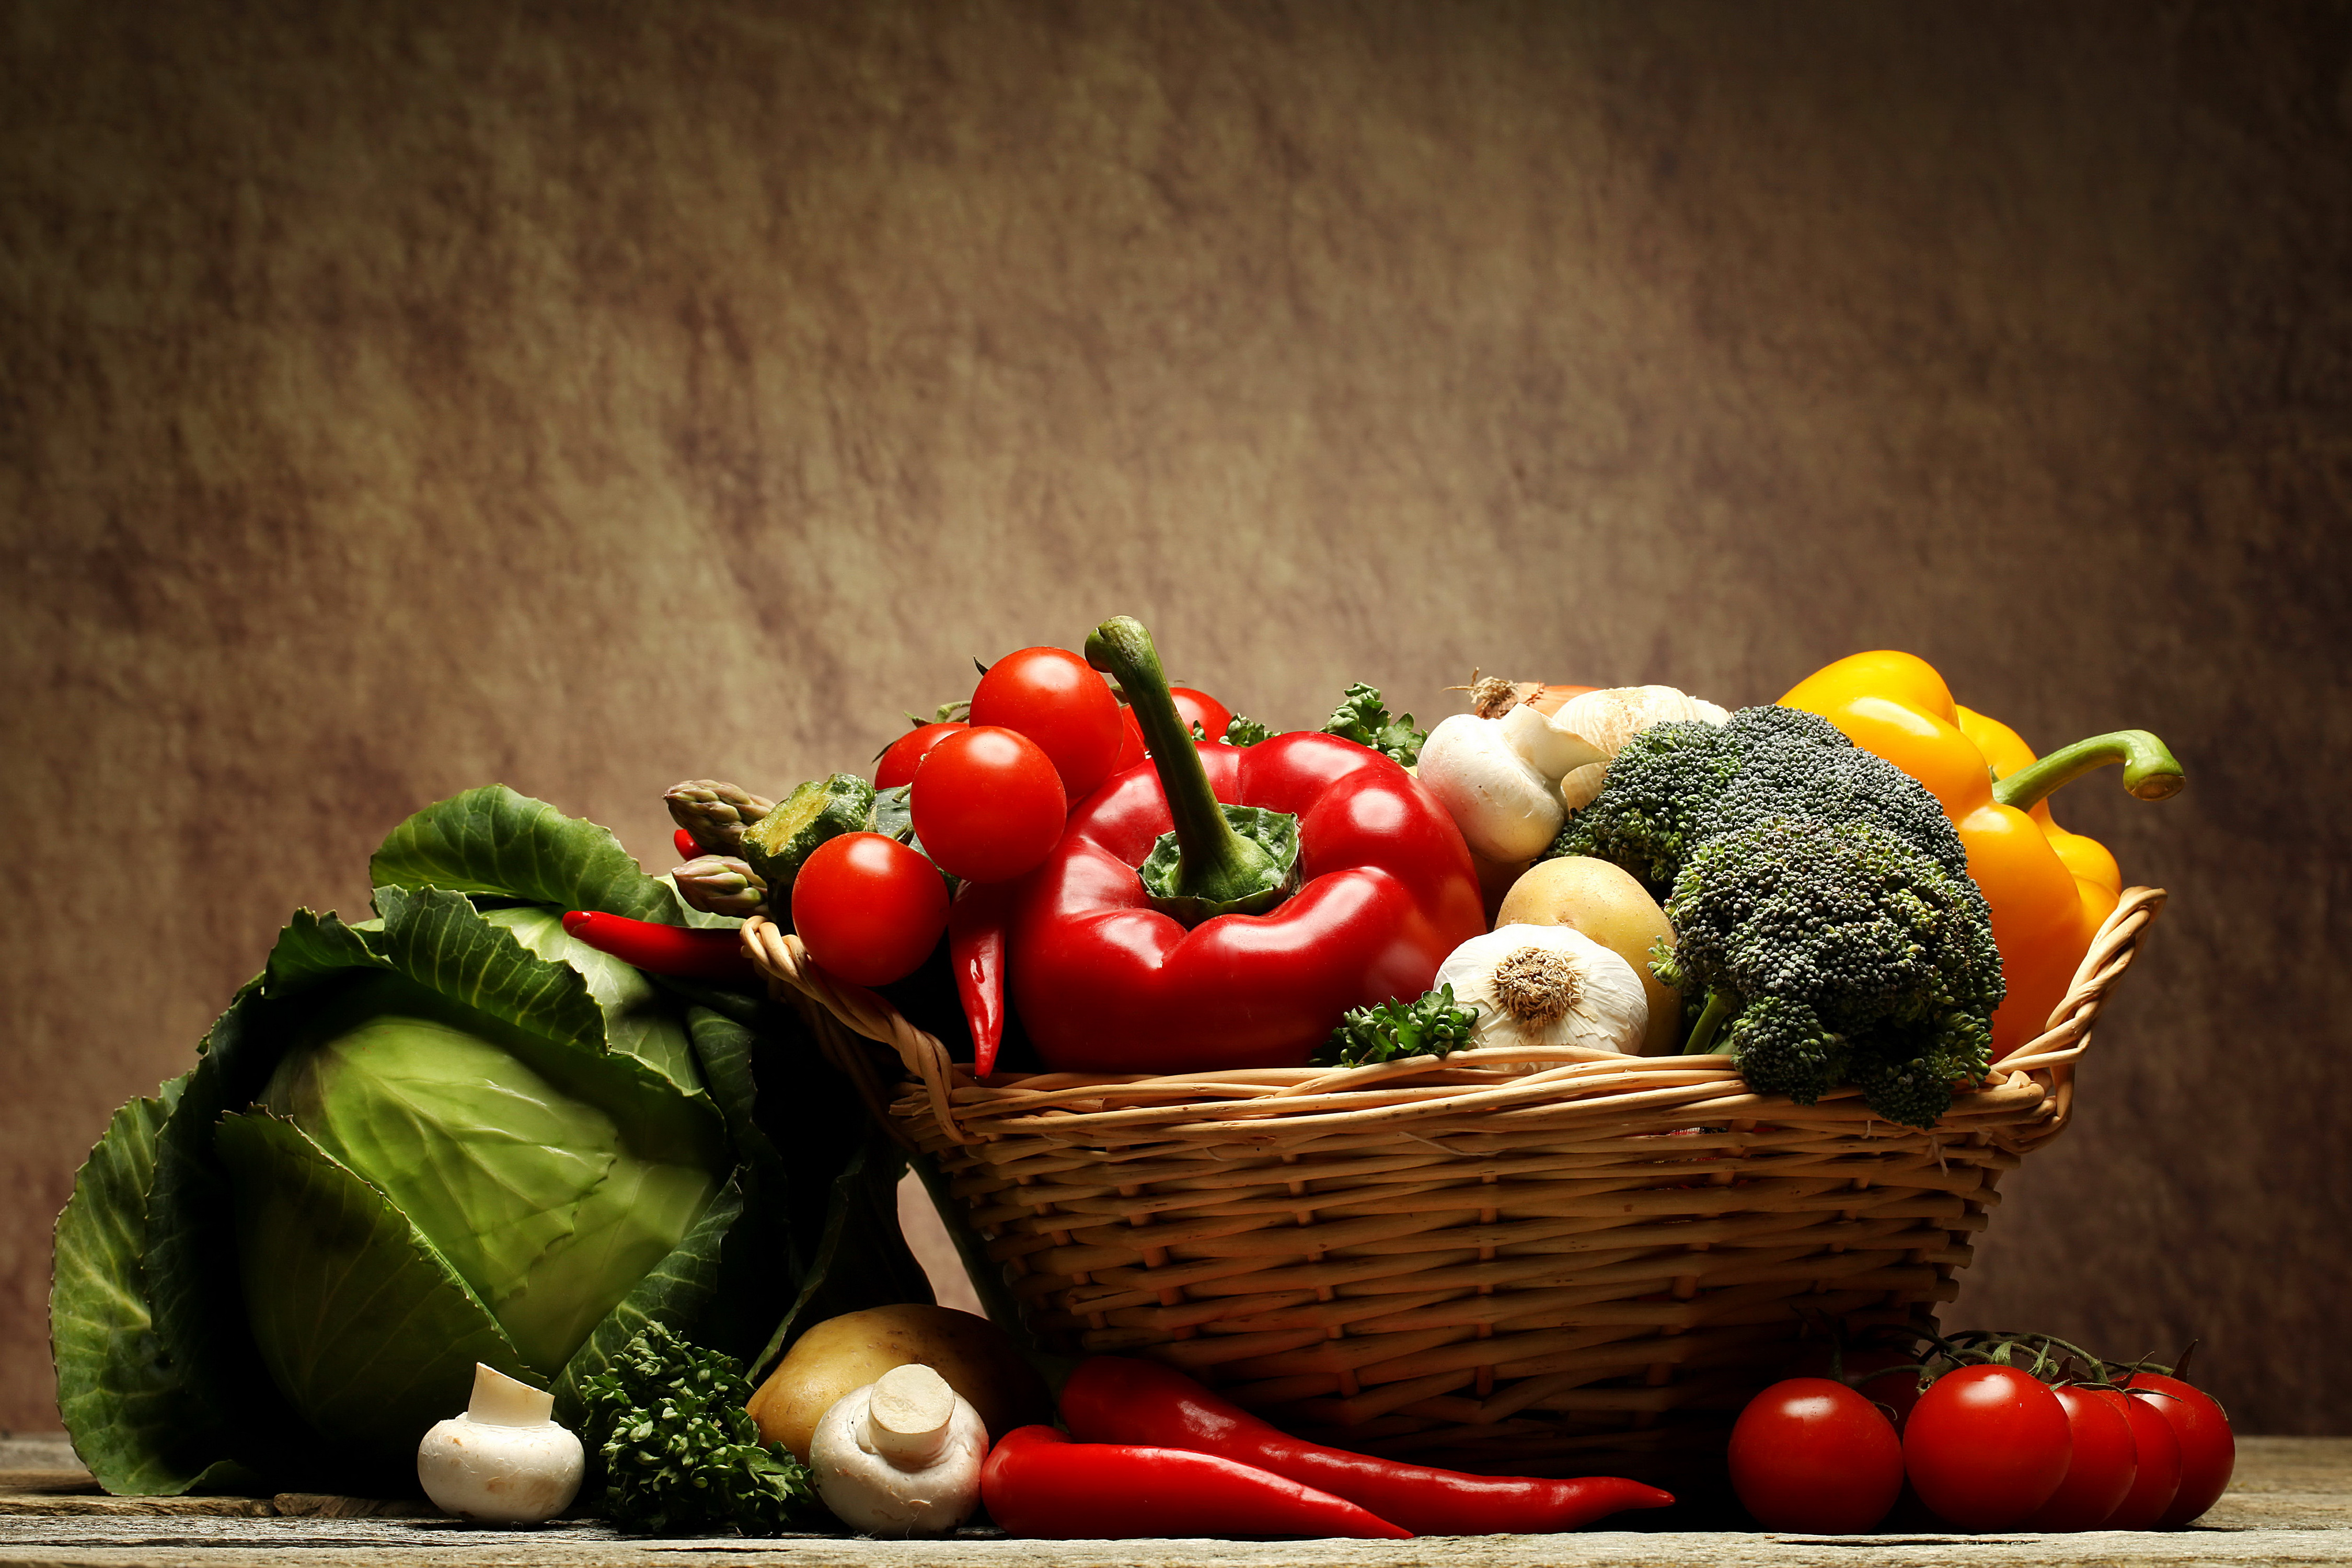 selling foodstuffs